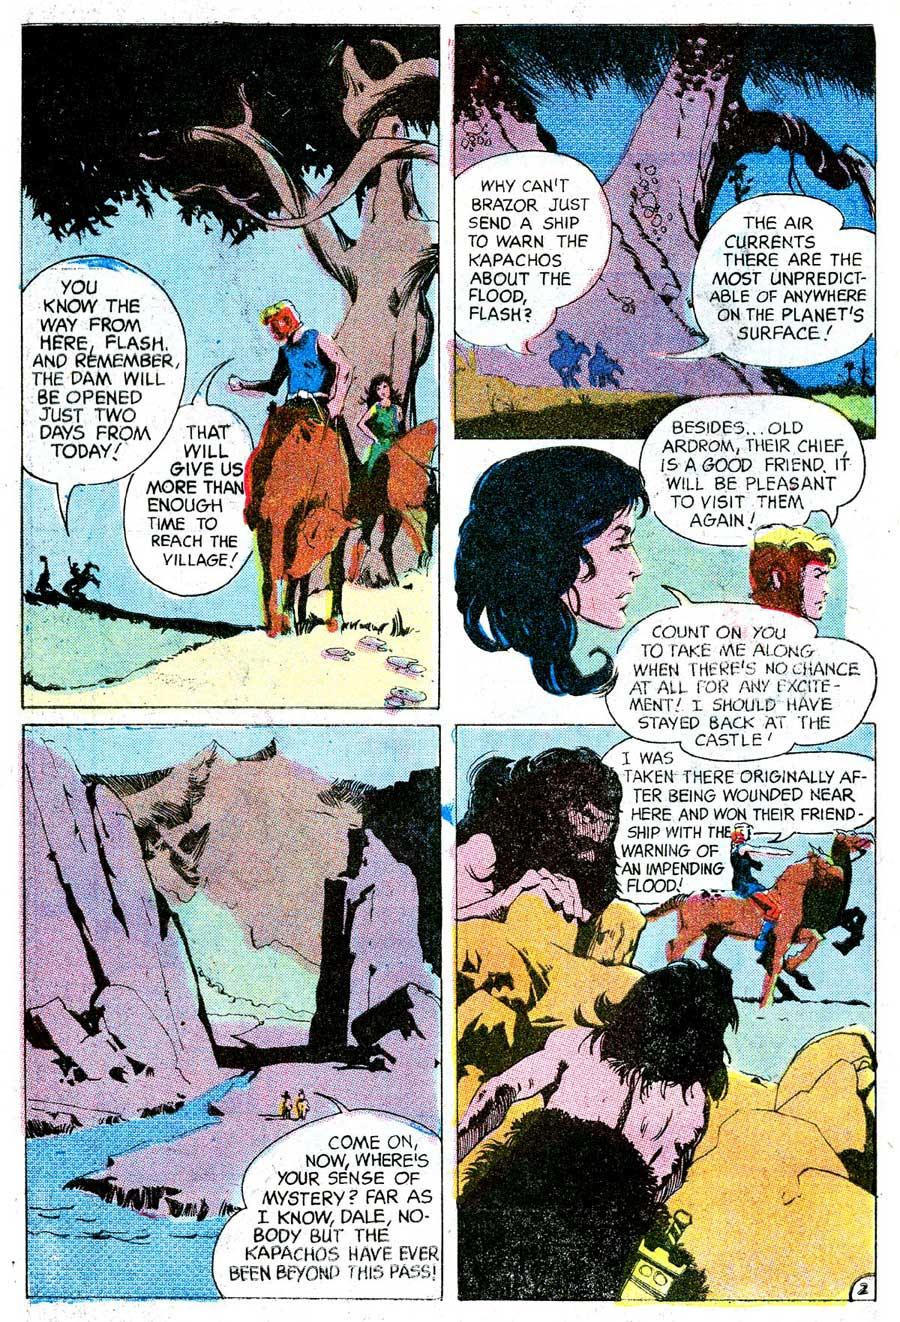 Flash Gordon v4 #13 1960s silver age science fiction comic book page art by Jeff Jones